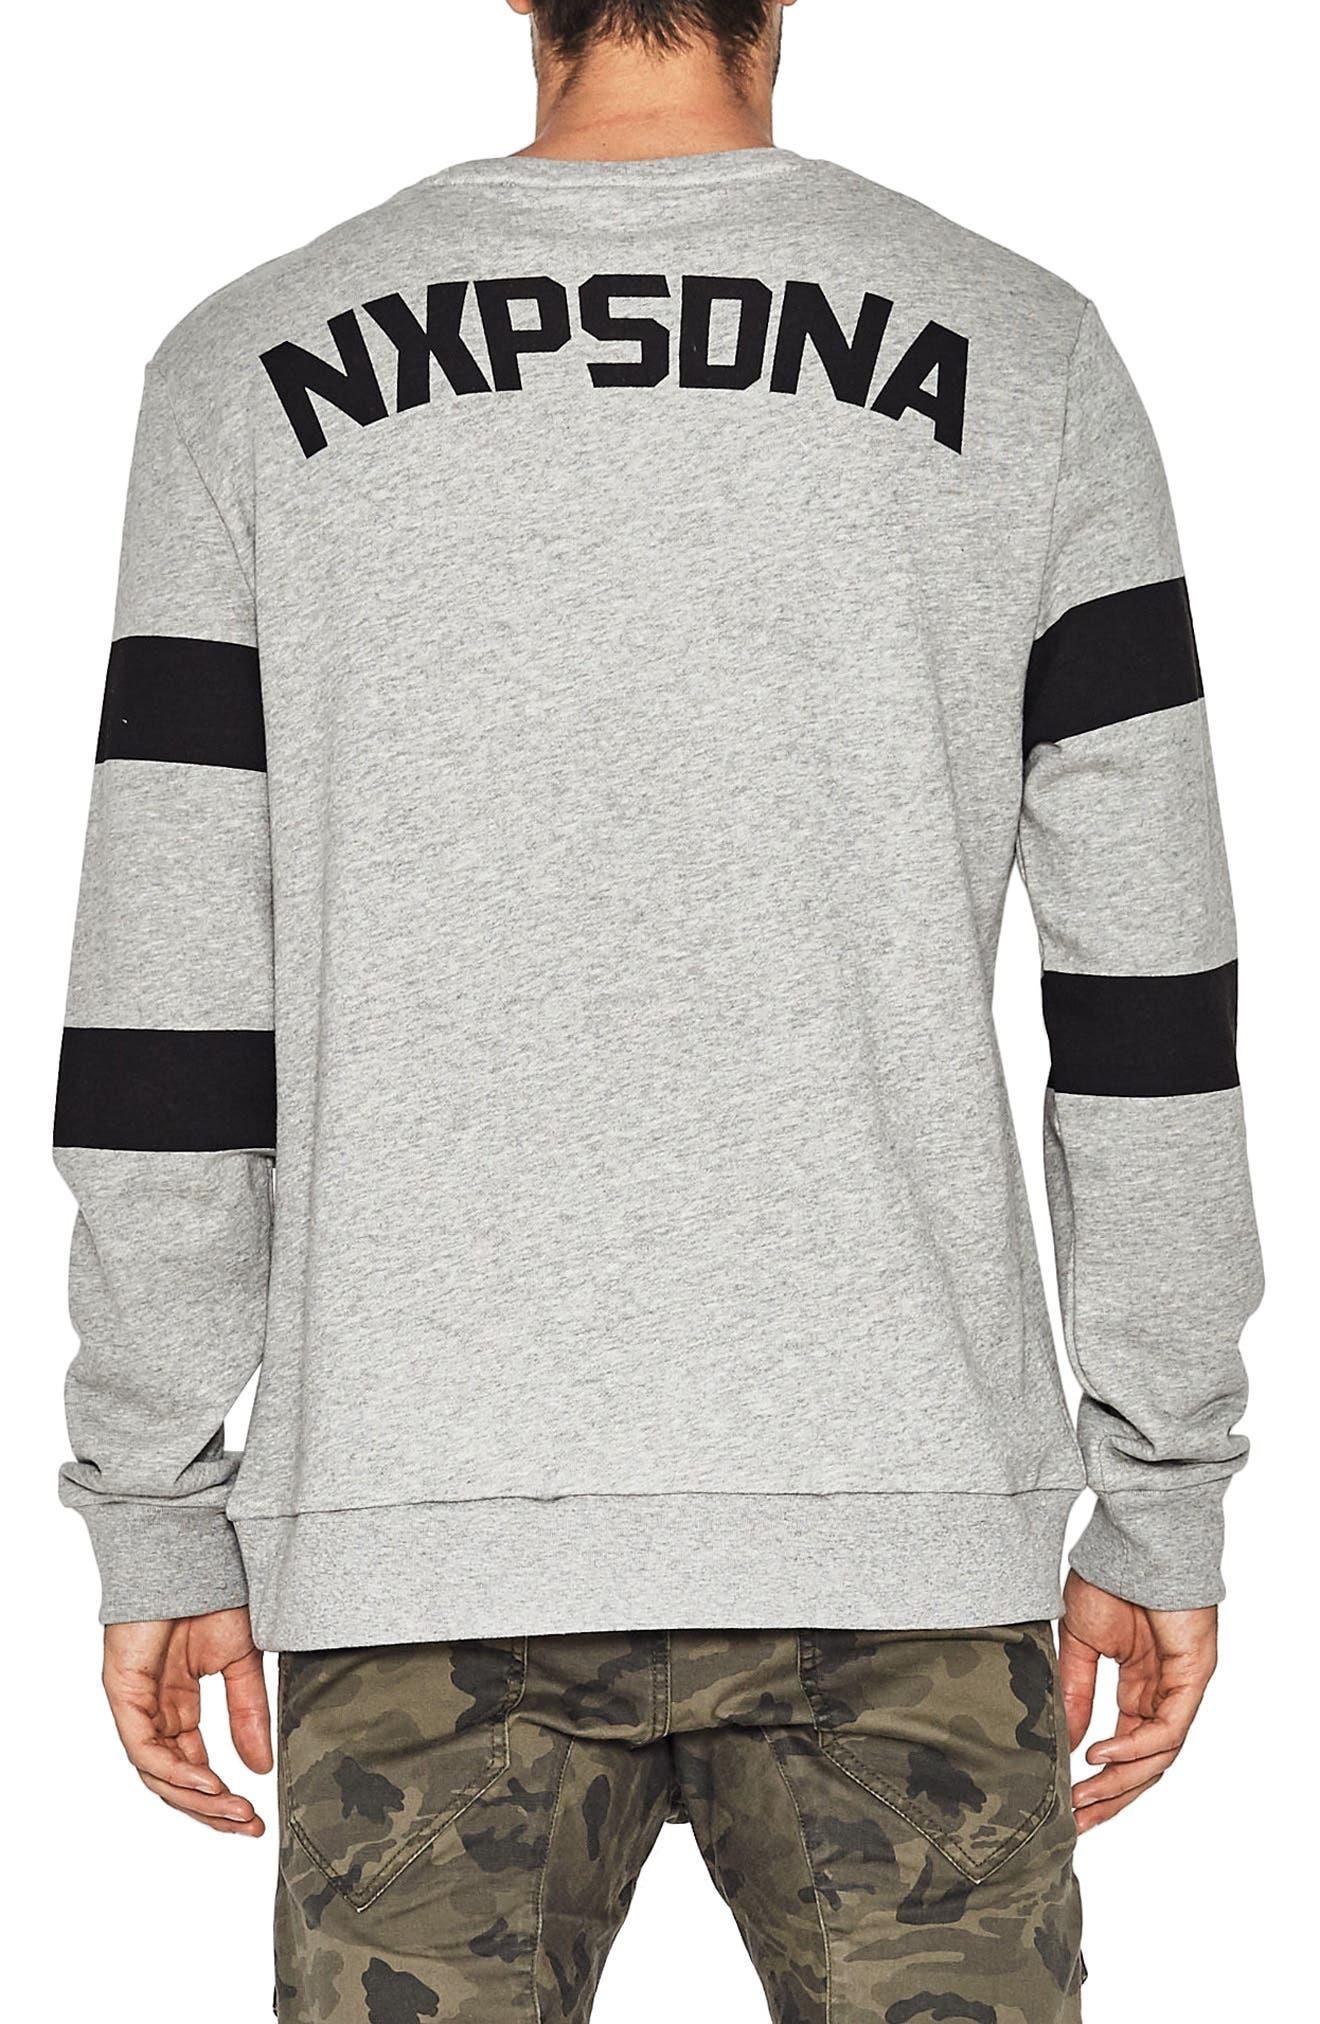 Turbo Hawk Sweatshirt,                             Alternate thumbnail 2, color,                             062